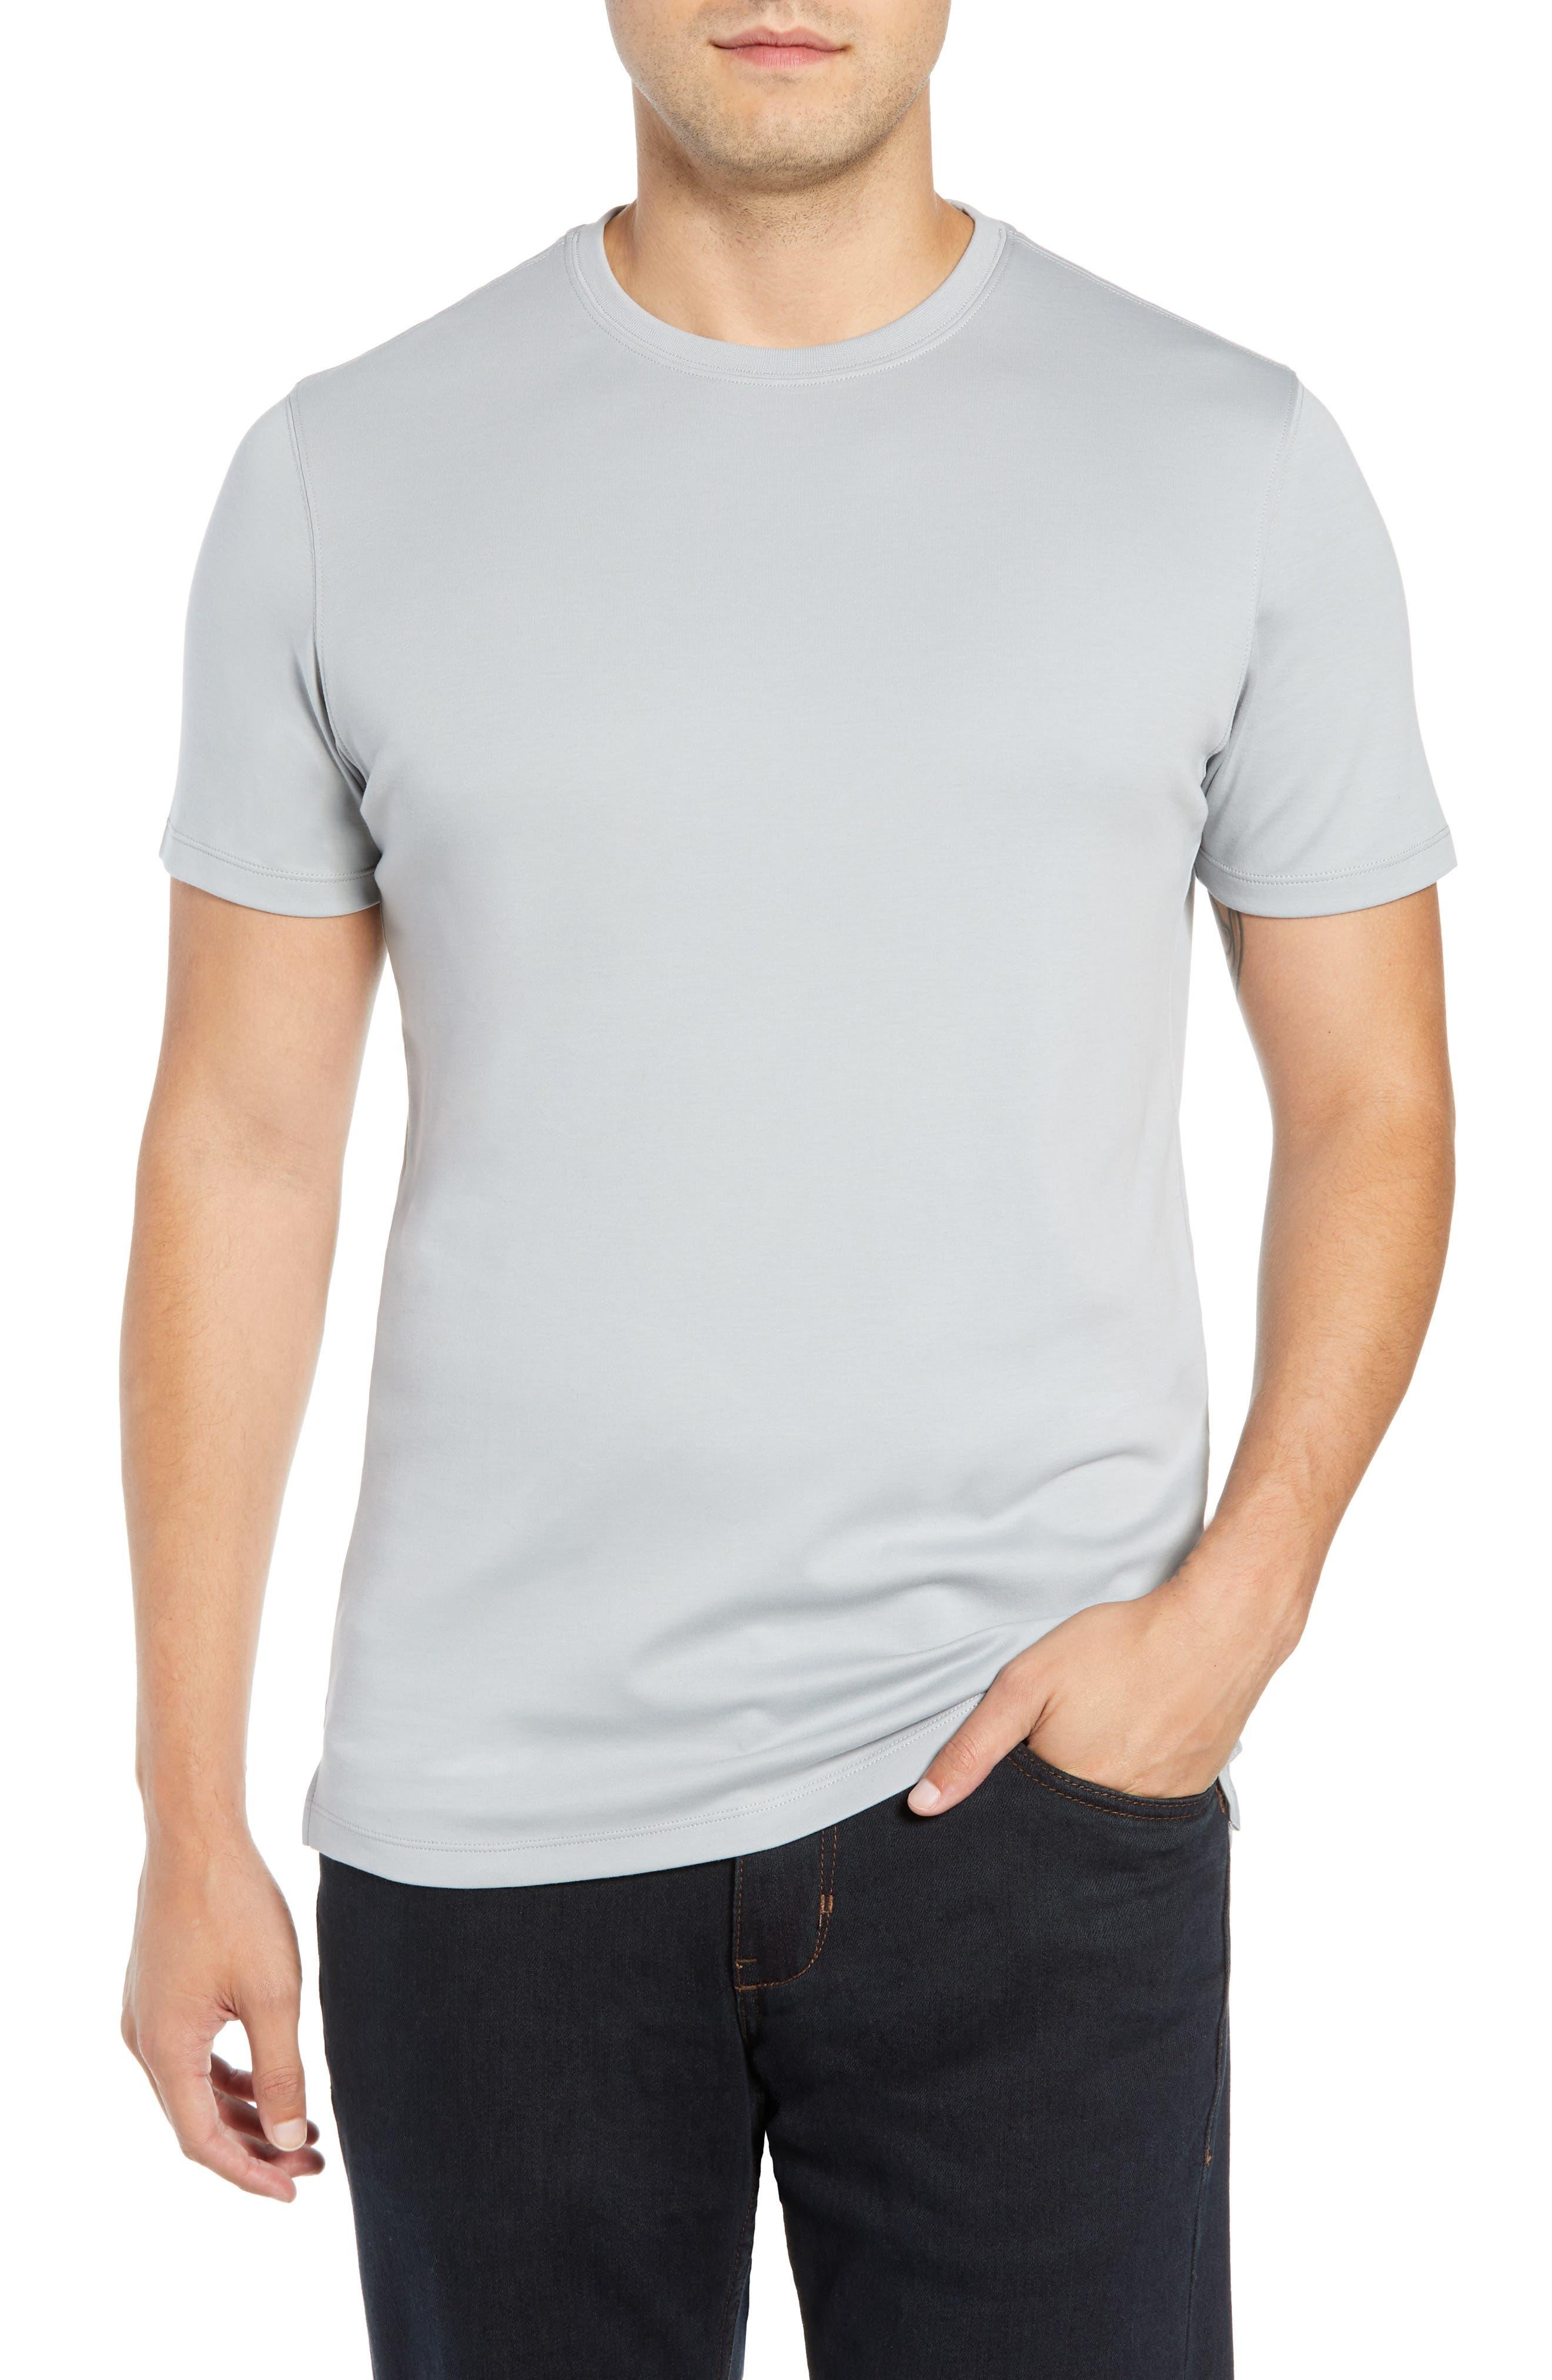 ROBERT BARAKETT,                             'Georgia' Crewneck T-Shirt,                             Main thumbnail 1, color,                             MOON DUST